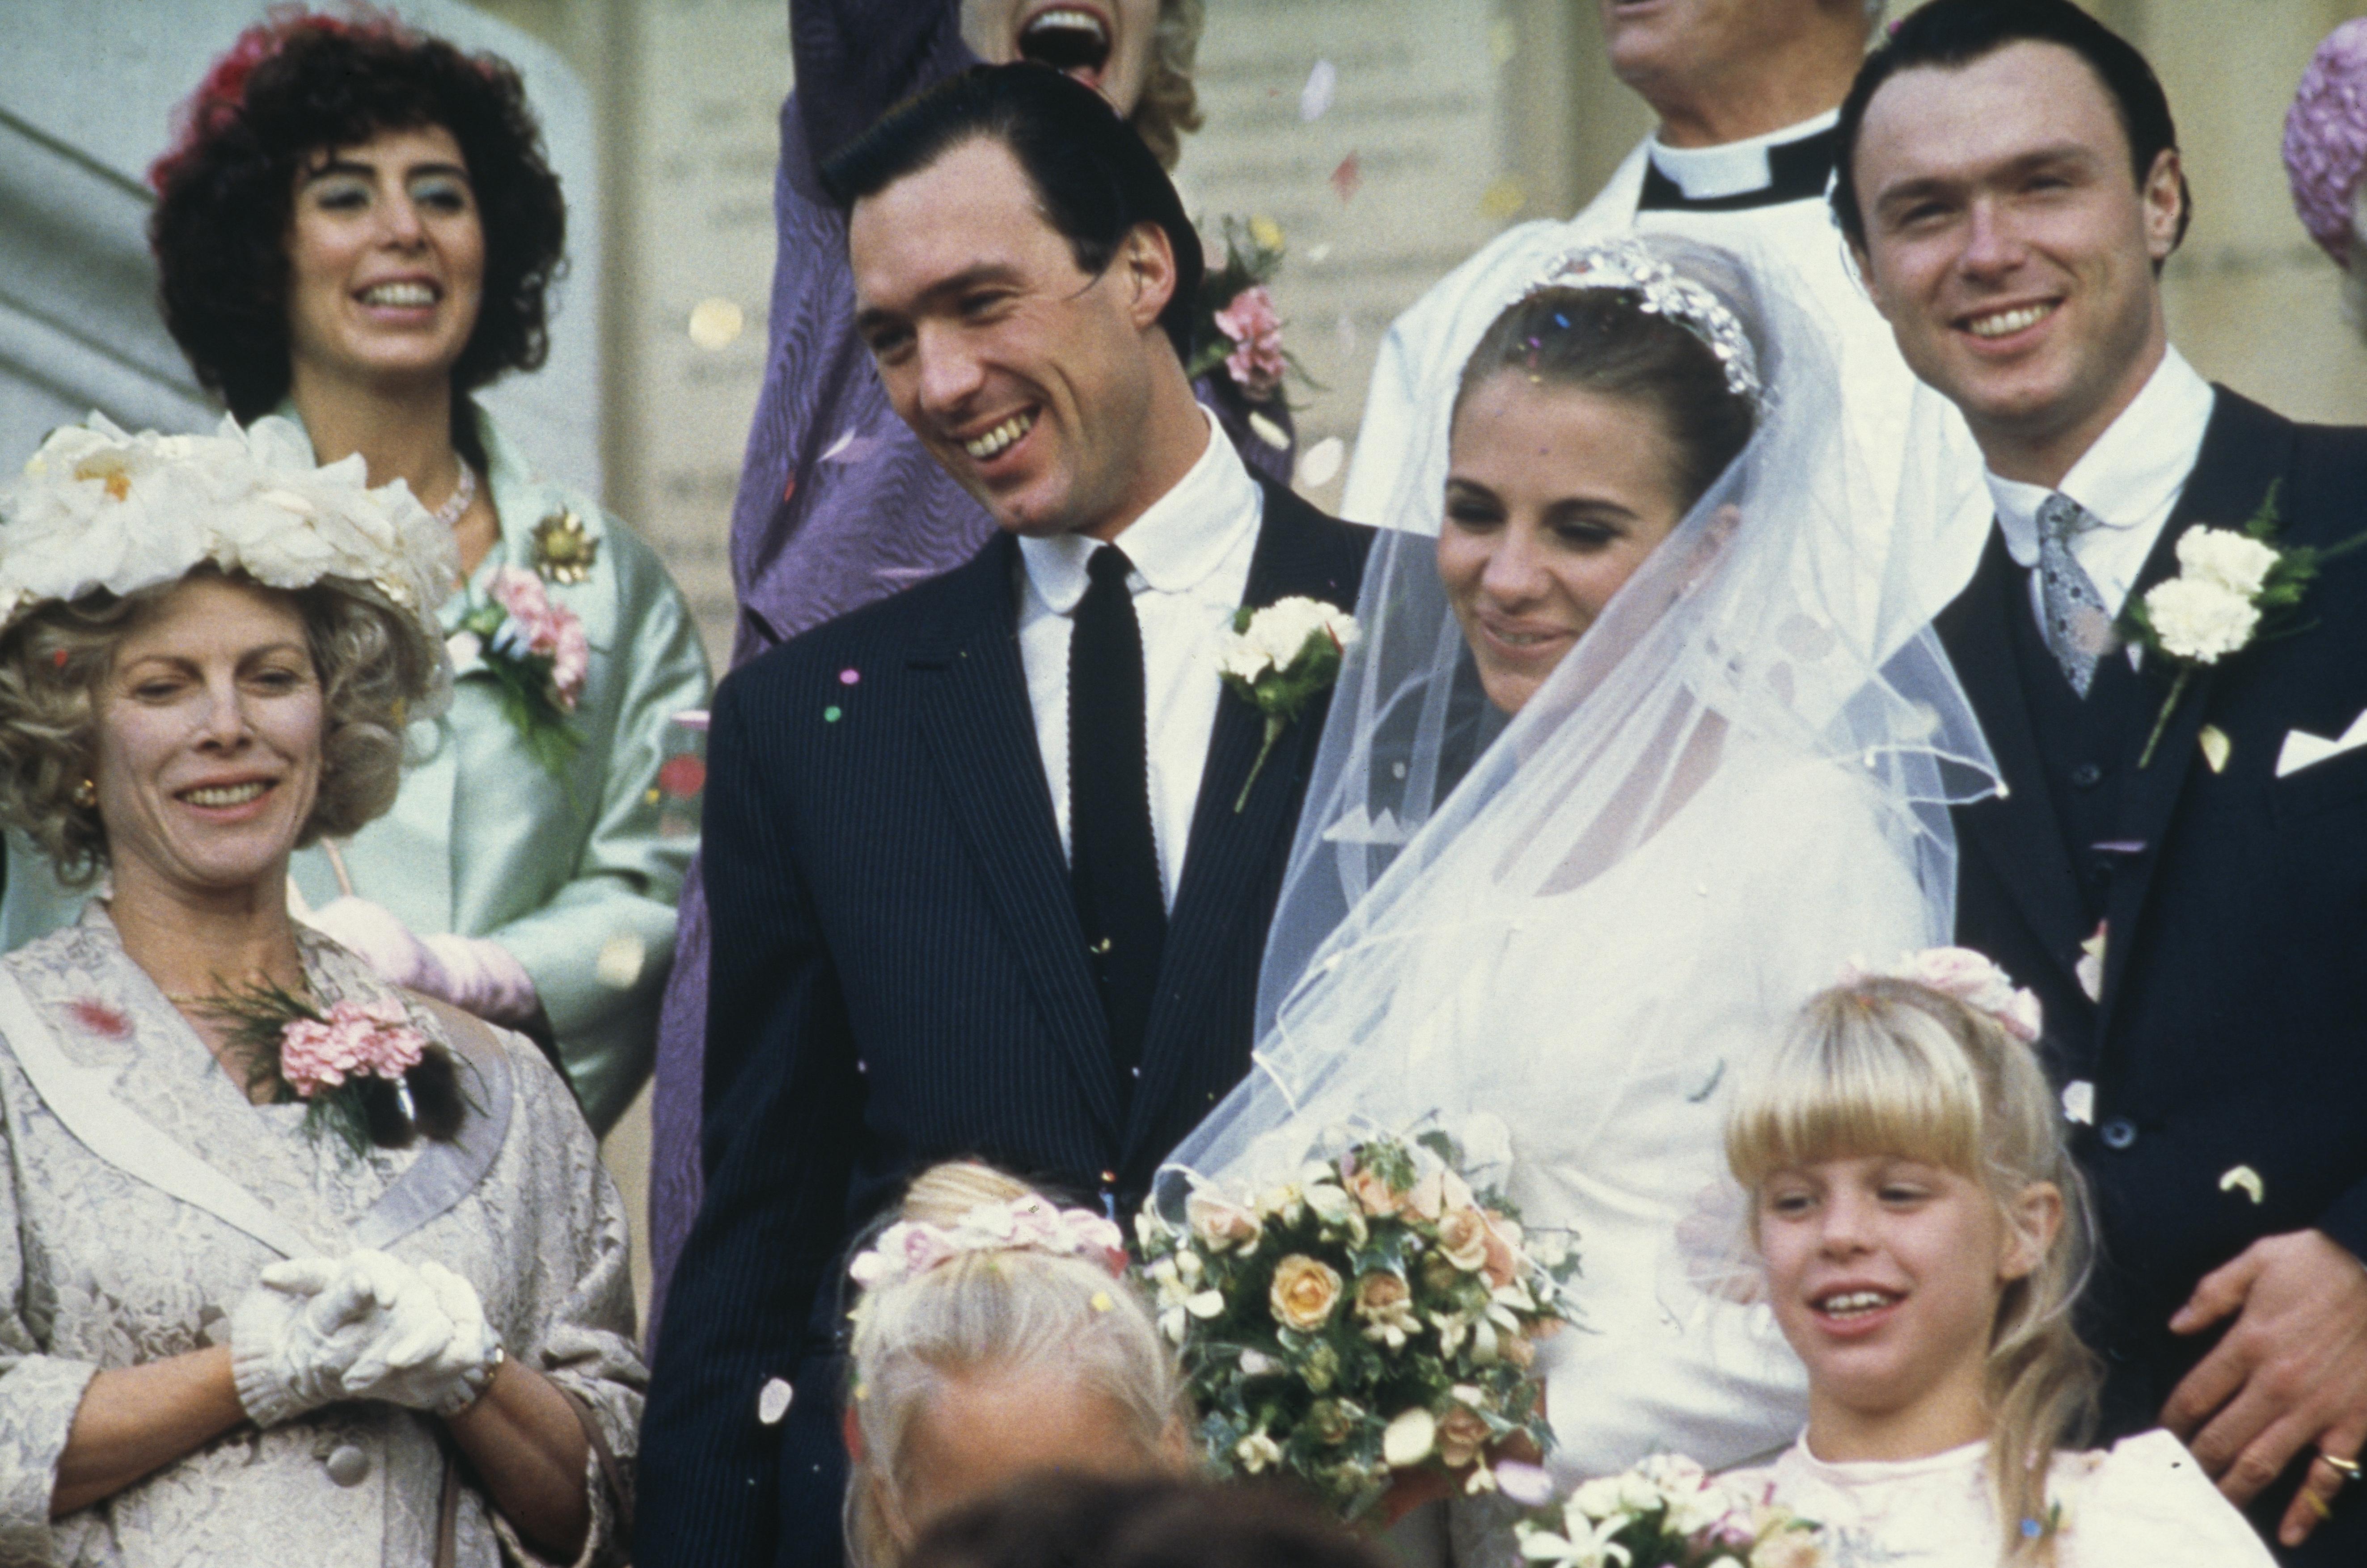 Kate Hardie, Gary Kemp, Martin Kemp, Patti Love, and Billie Whitelaw in The Krays (1990)